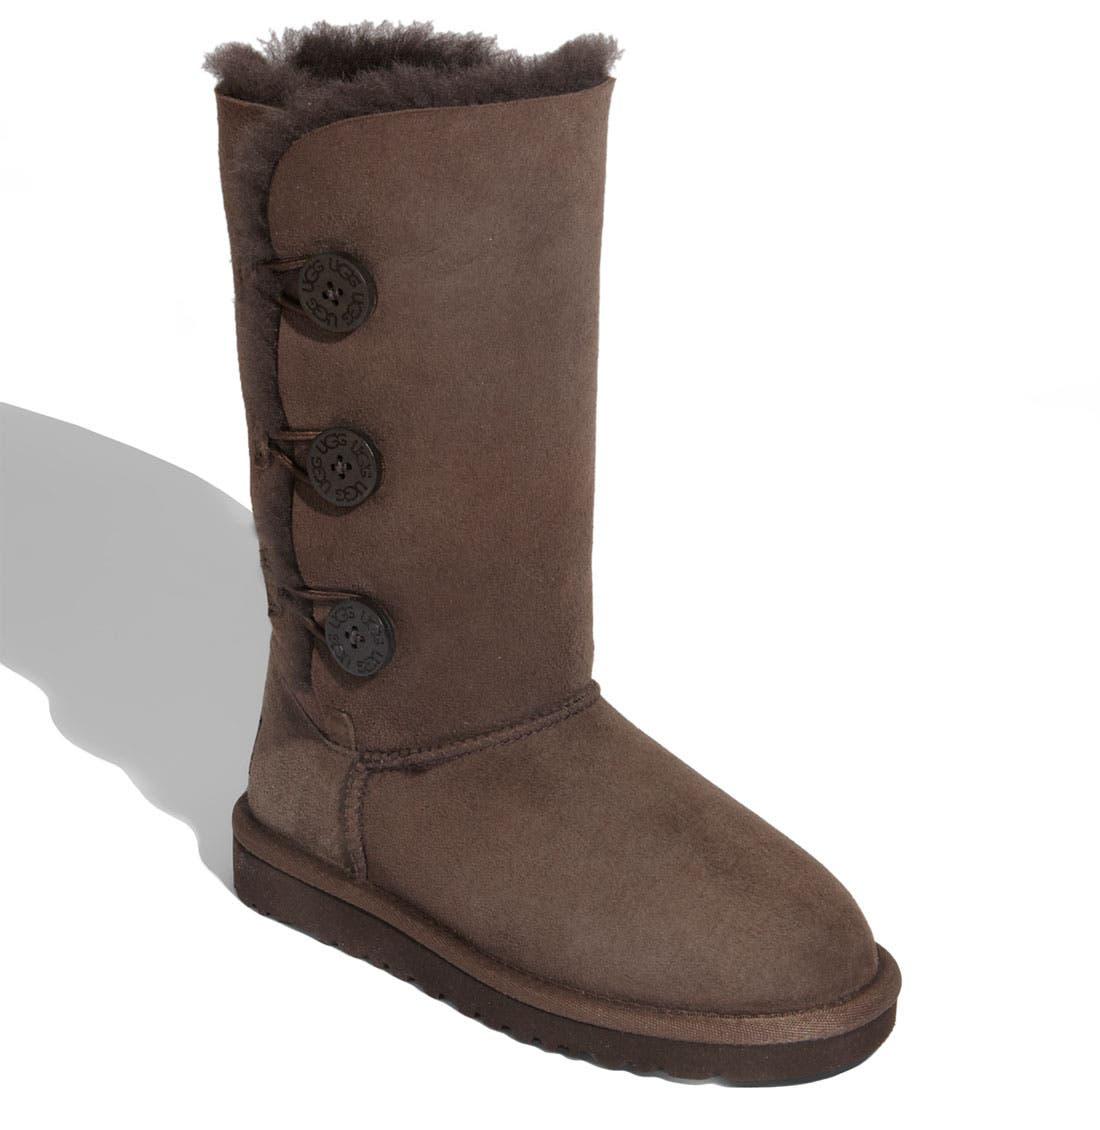 Alternate Image 1 Selected - UGG® 'Bailey Button Triplet' Boot (Little Kid & Big Kid)